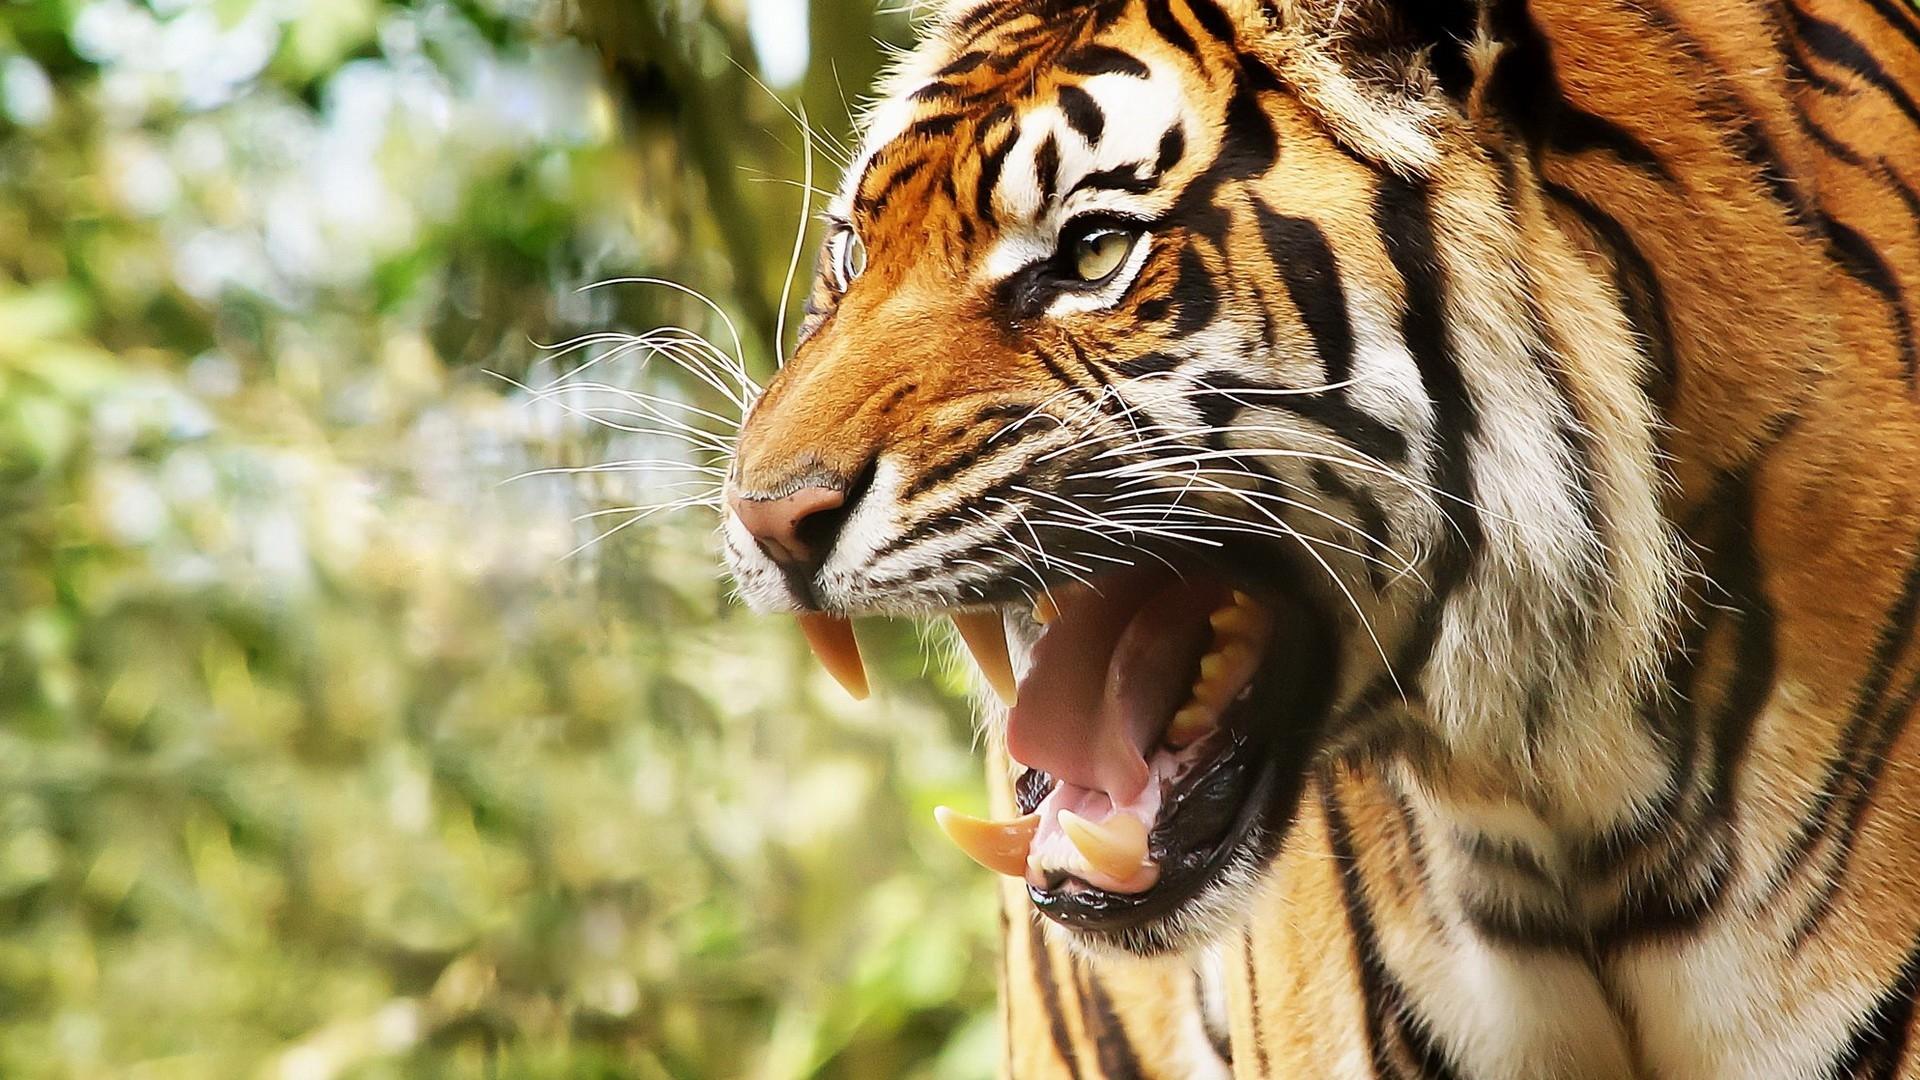 Wallpaper Face Tiger Anger Wildlife Teeth Big Cats Zoo